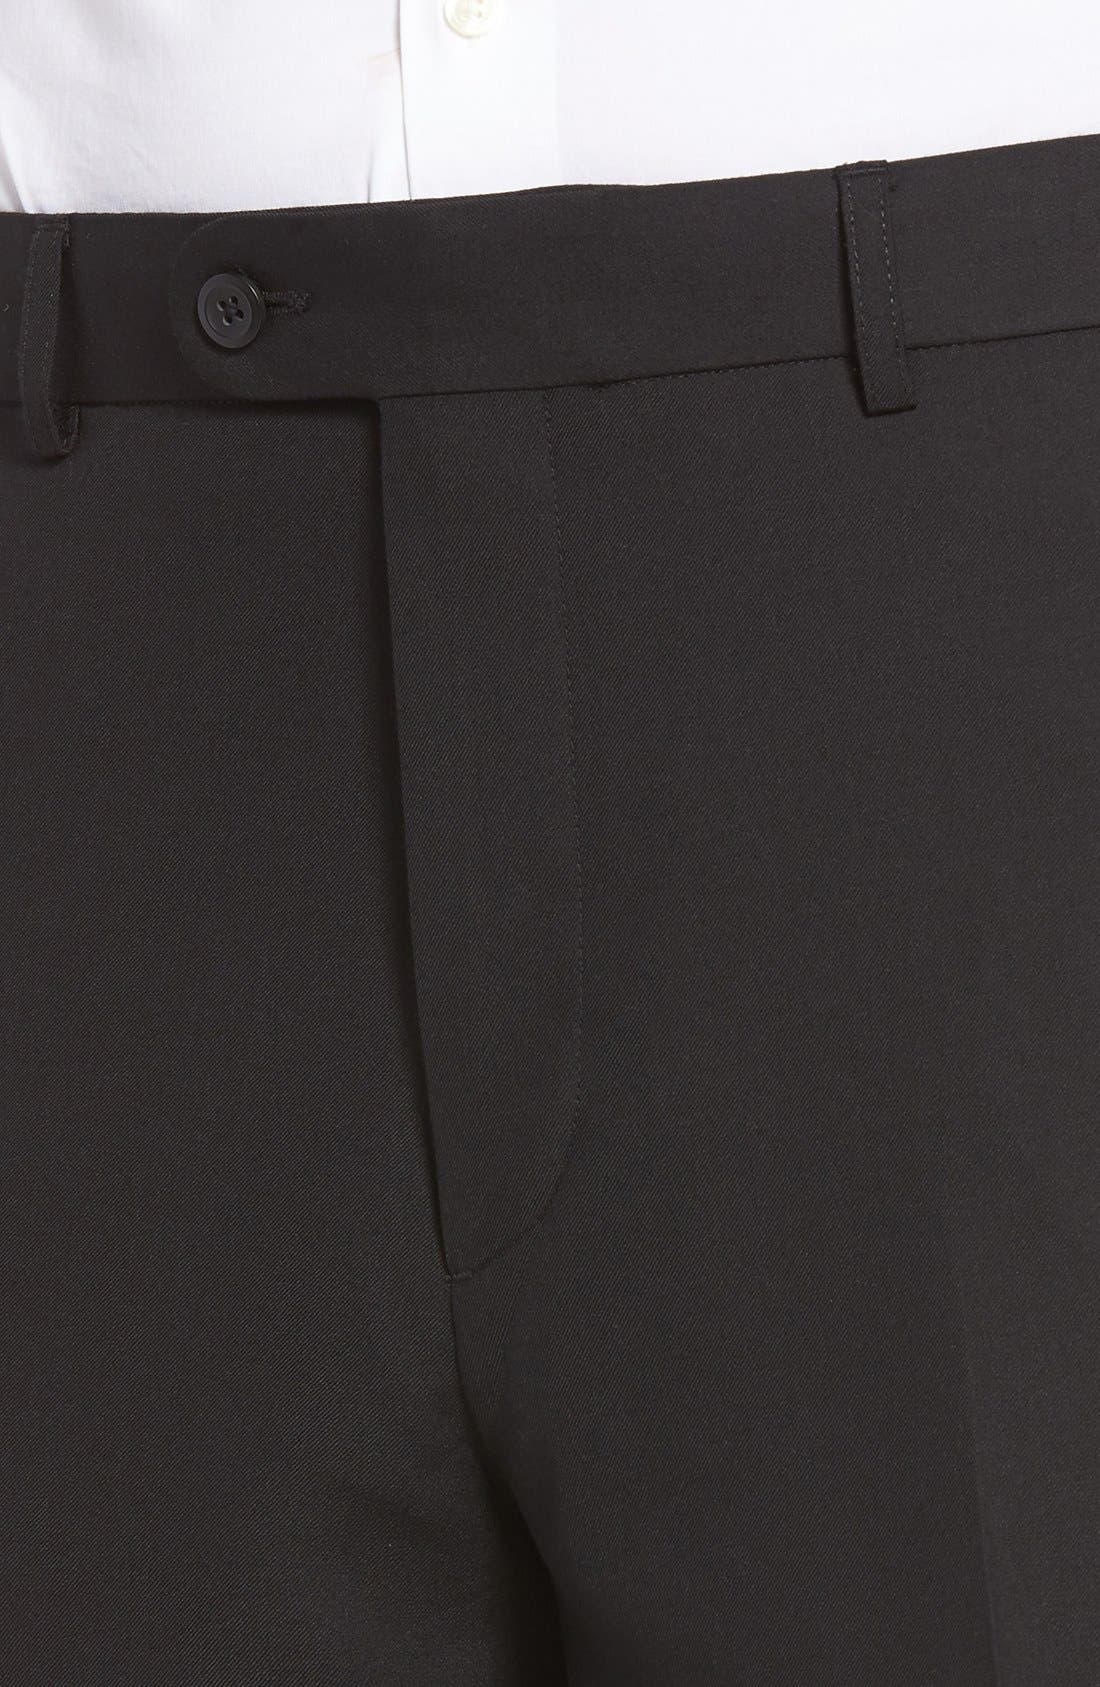 'Travel Genius - Hawk' Flat Front Pants,                             Alternate thumbnail 4, color,                             001